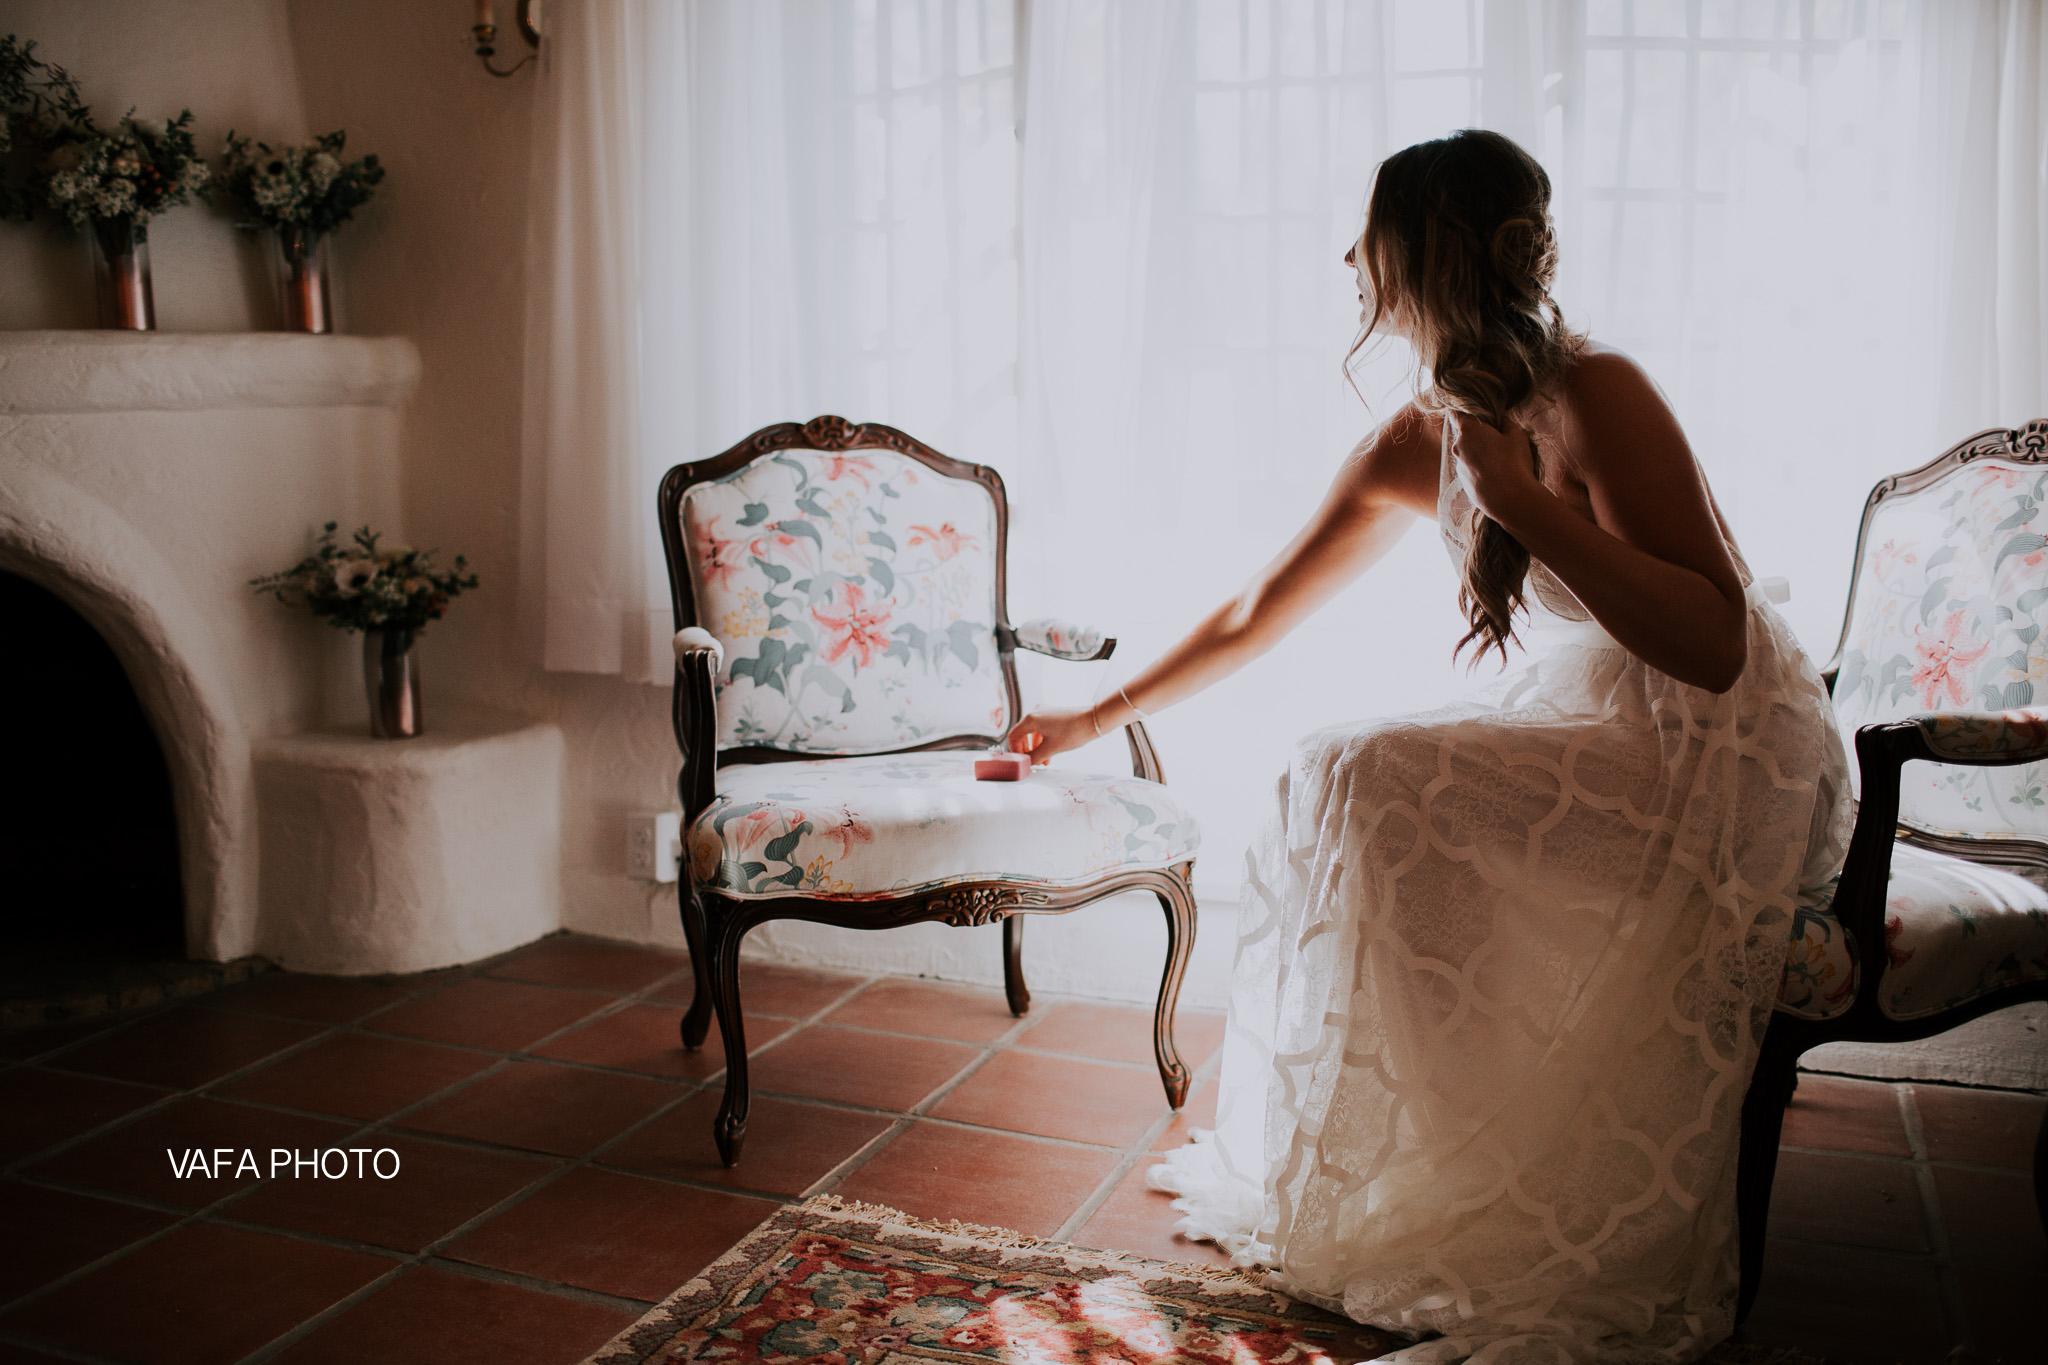 Leo-Carrillo-Ranch-Wedding-Lauren-Mike-Vafa-Photo-171.jpg